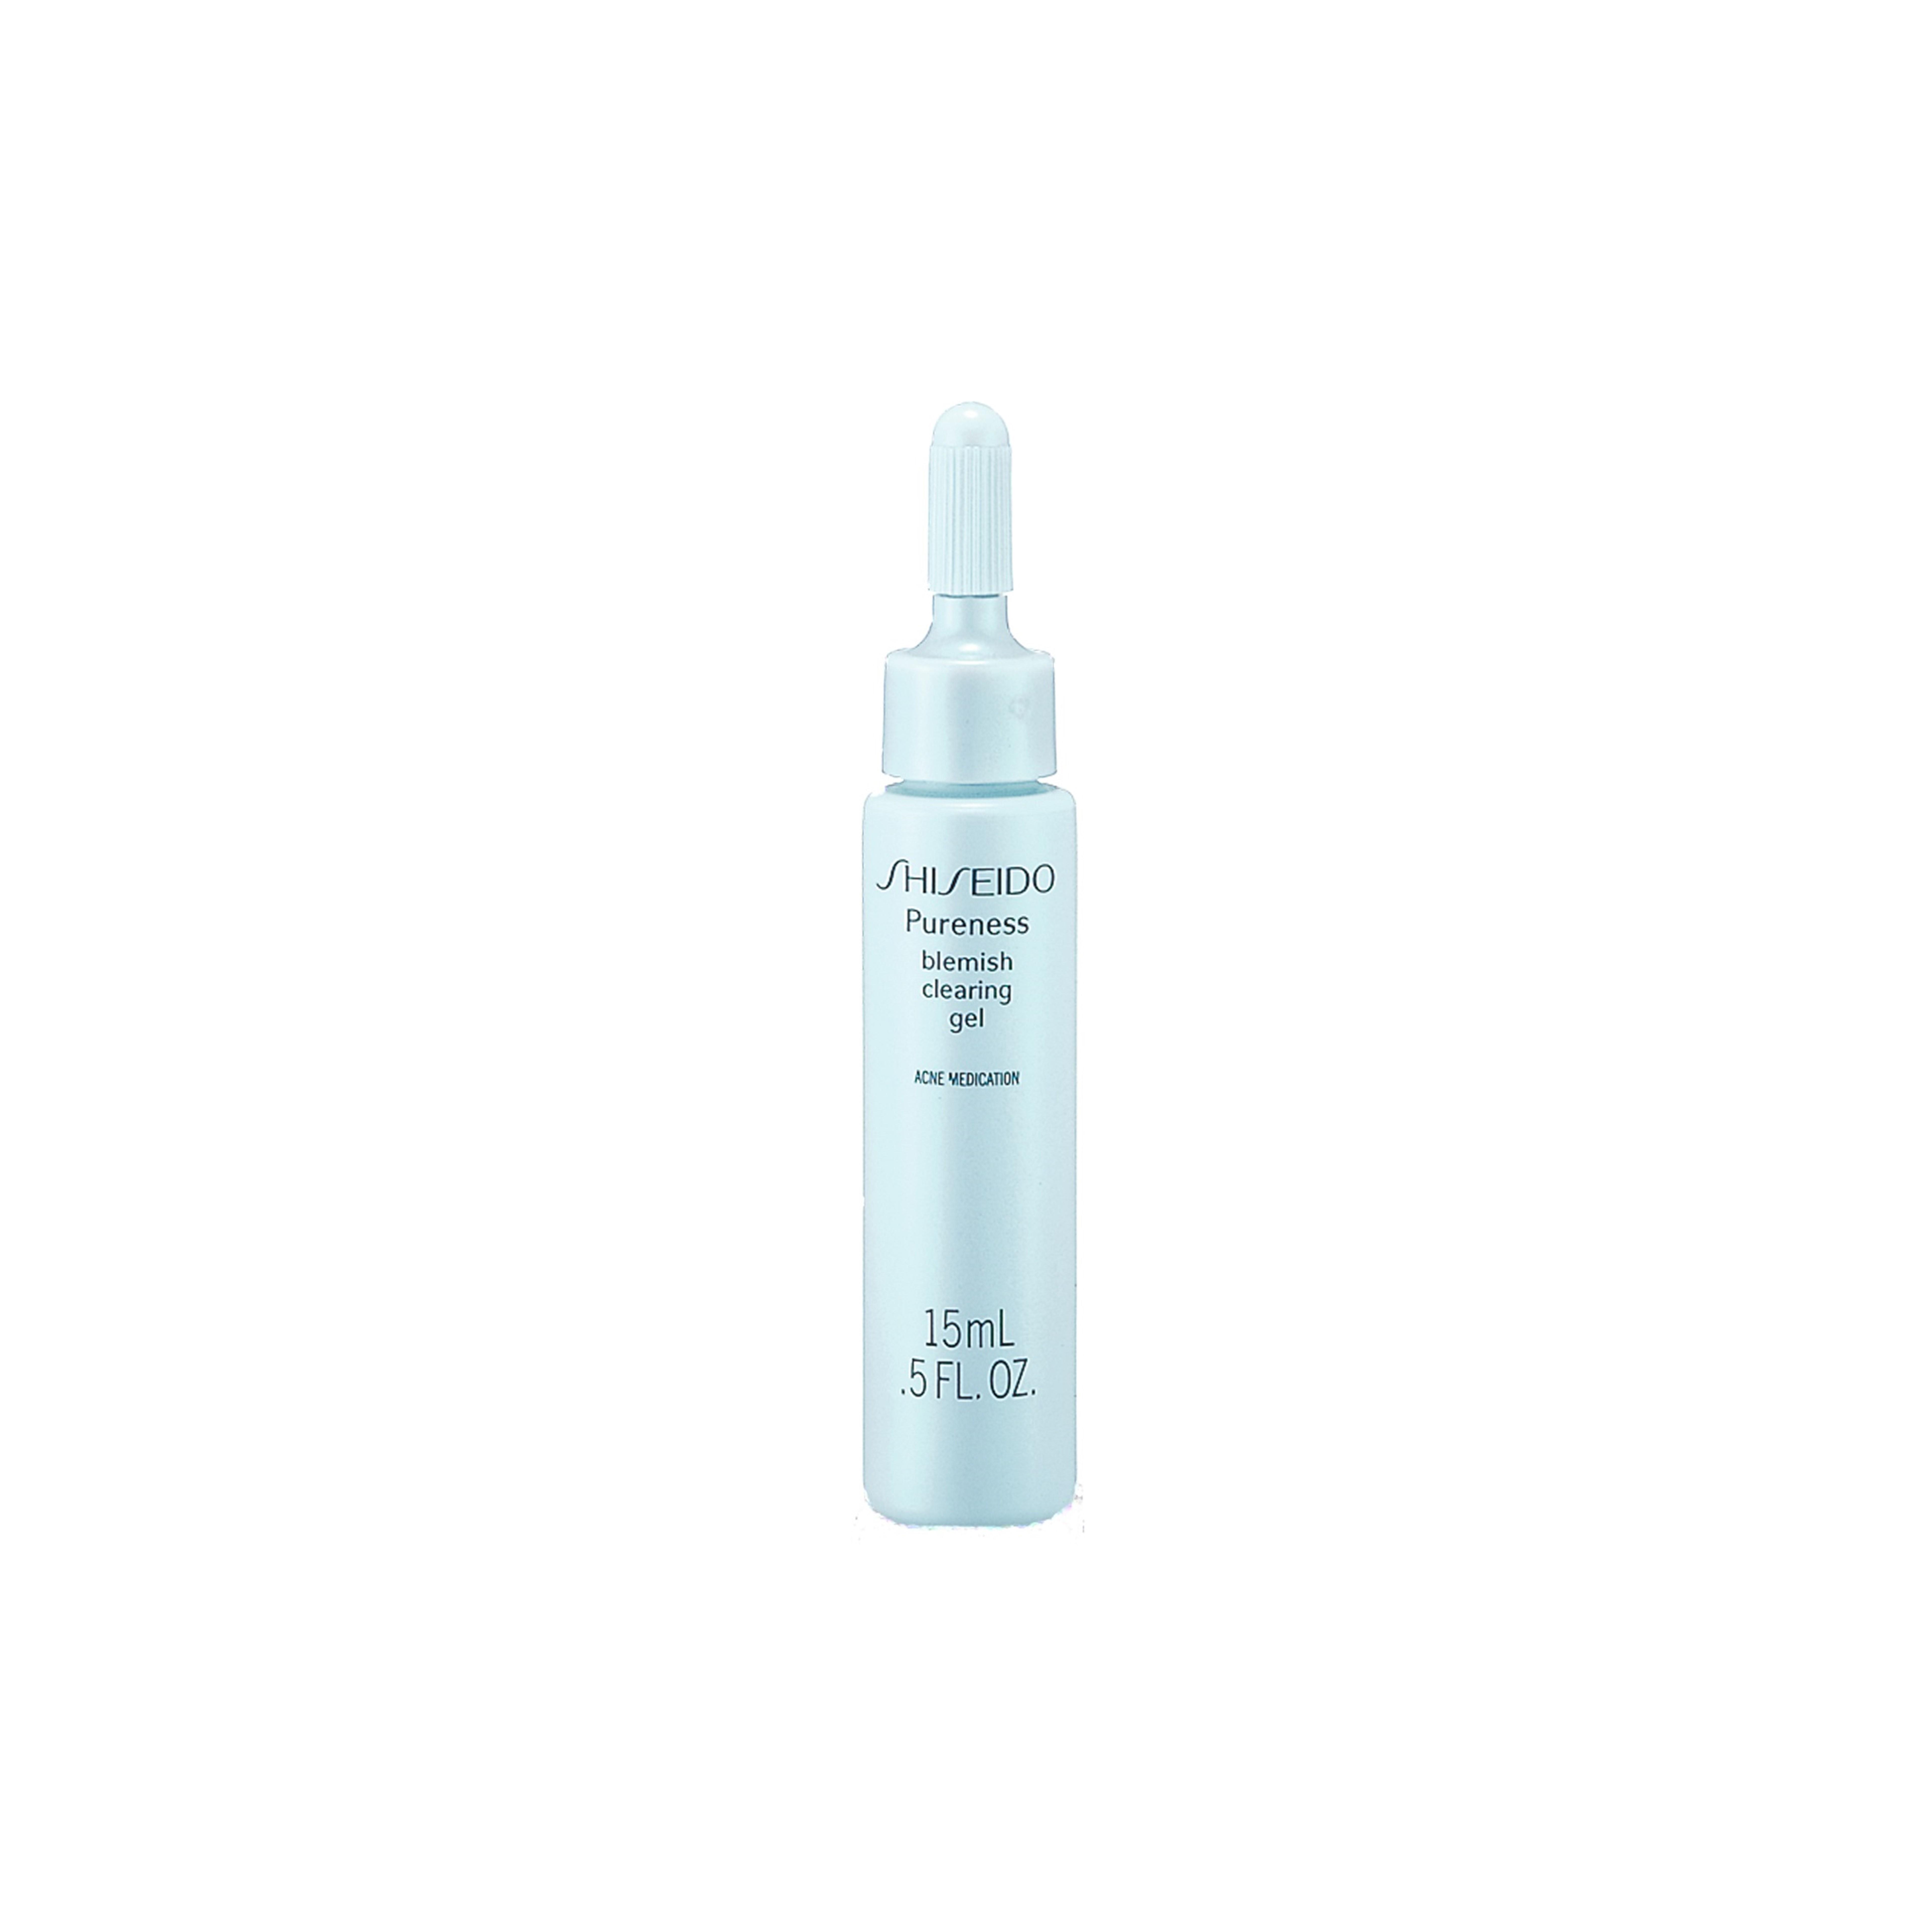 Shiseido Pureness Blemish Clearing Gel